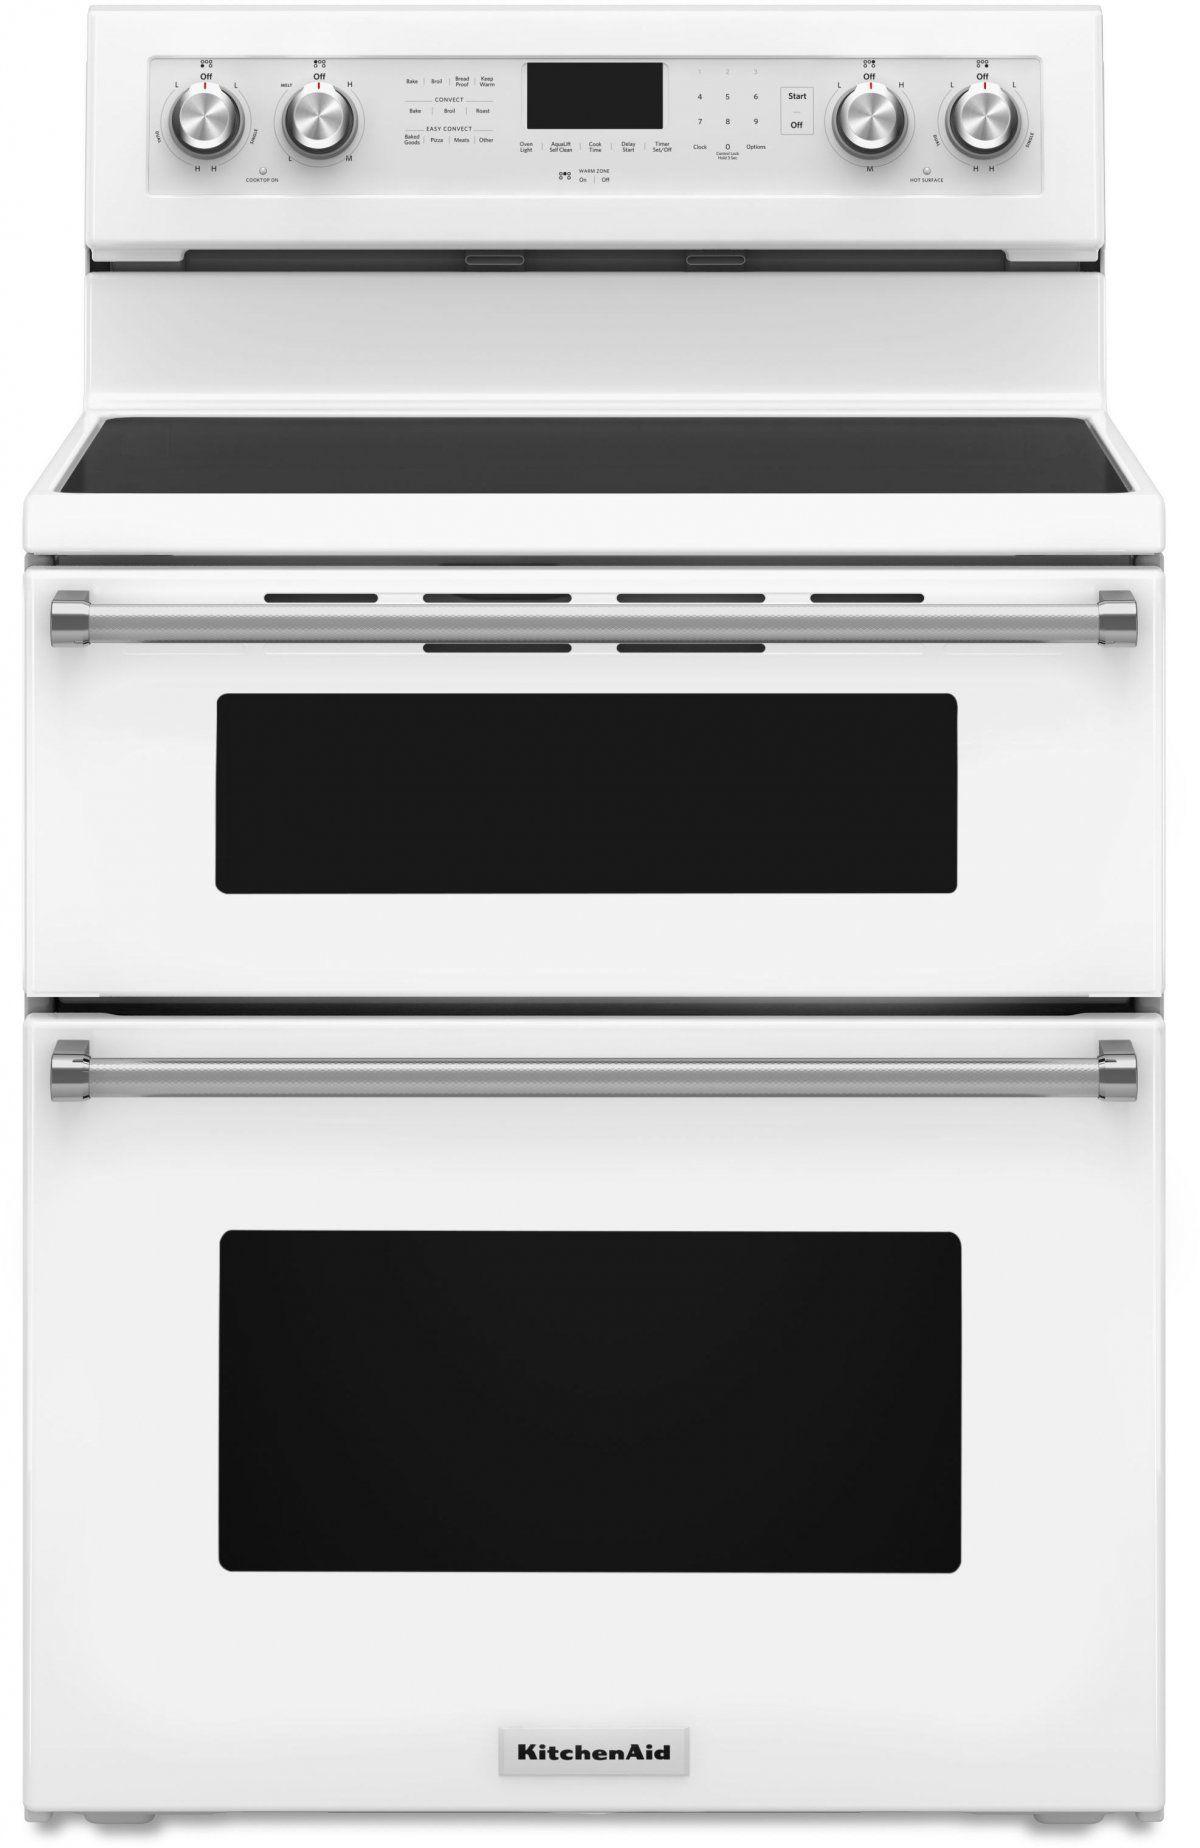 kitchenaid 29 cu ft refrigerator manual